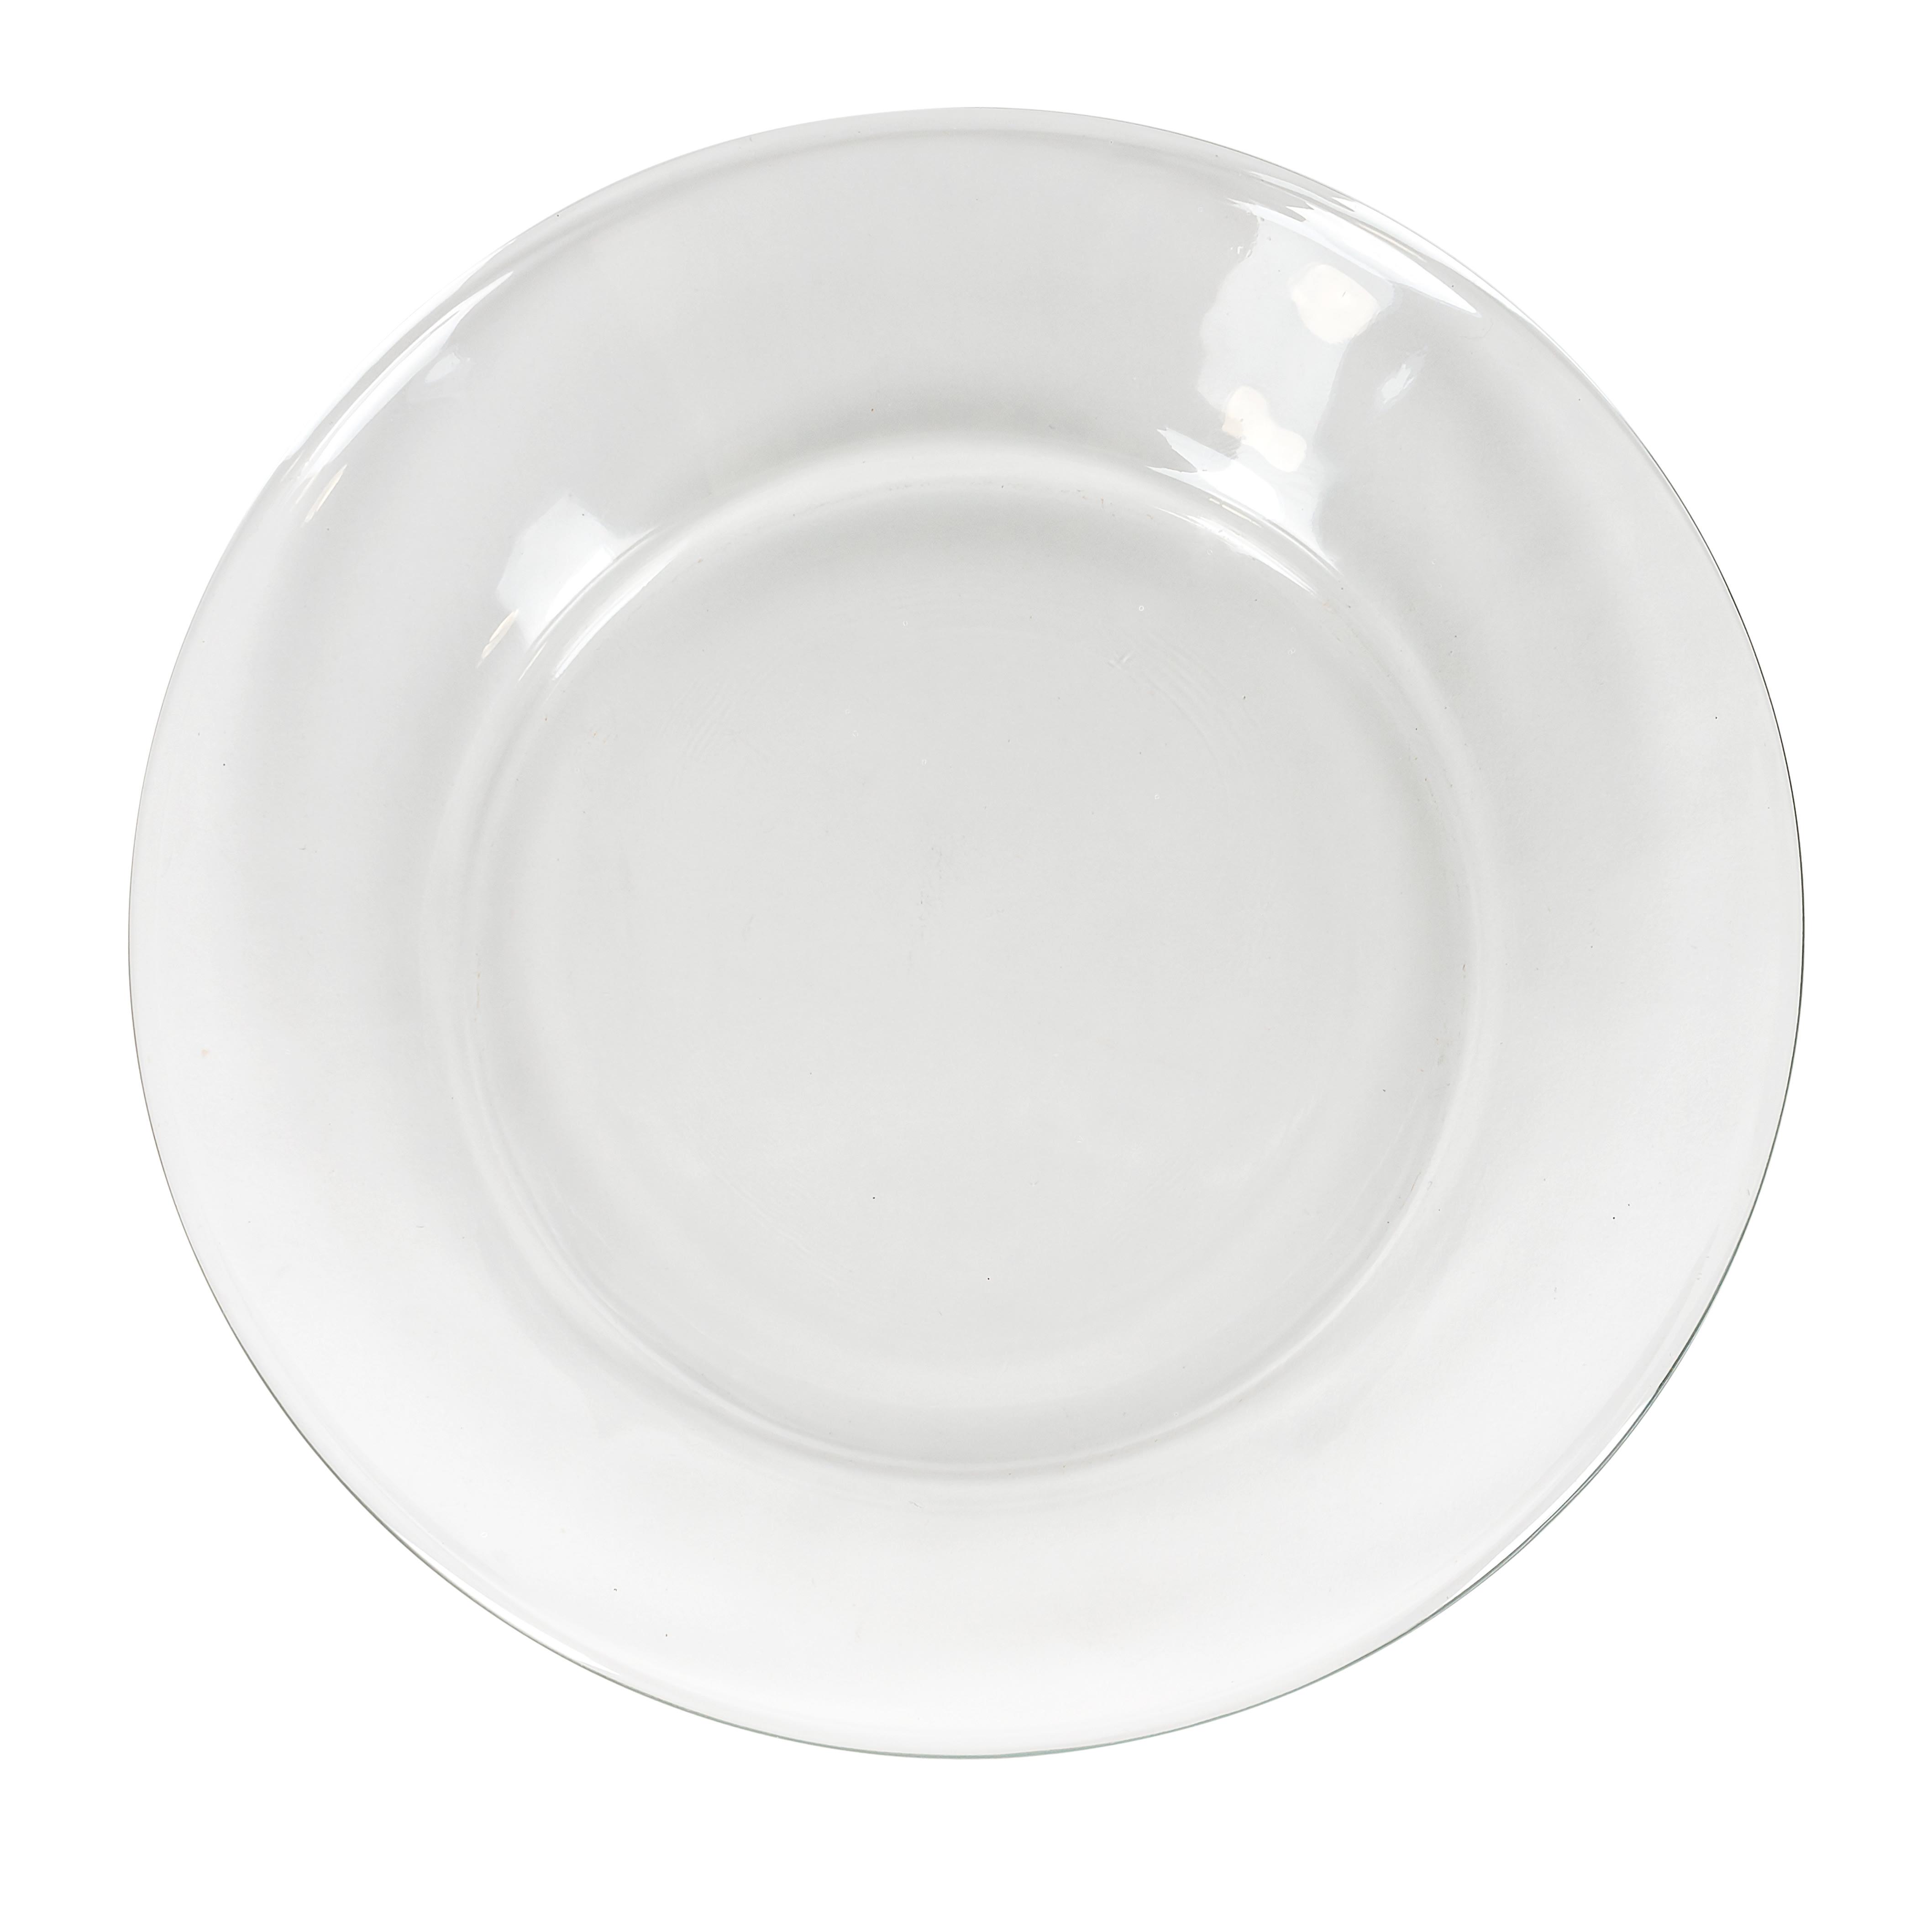 "Libbey 1788491 7.5"" Crisa Moderno Tempered Salad Dessert Plate"